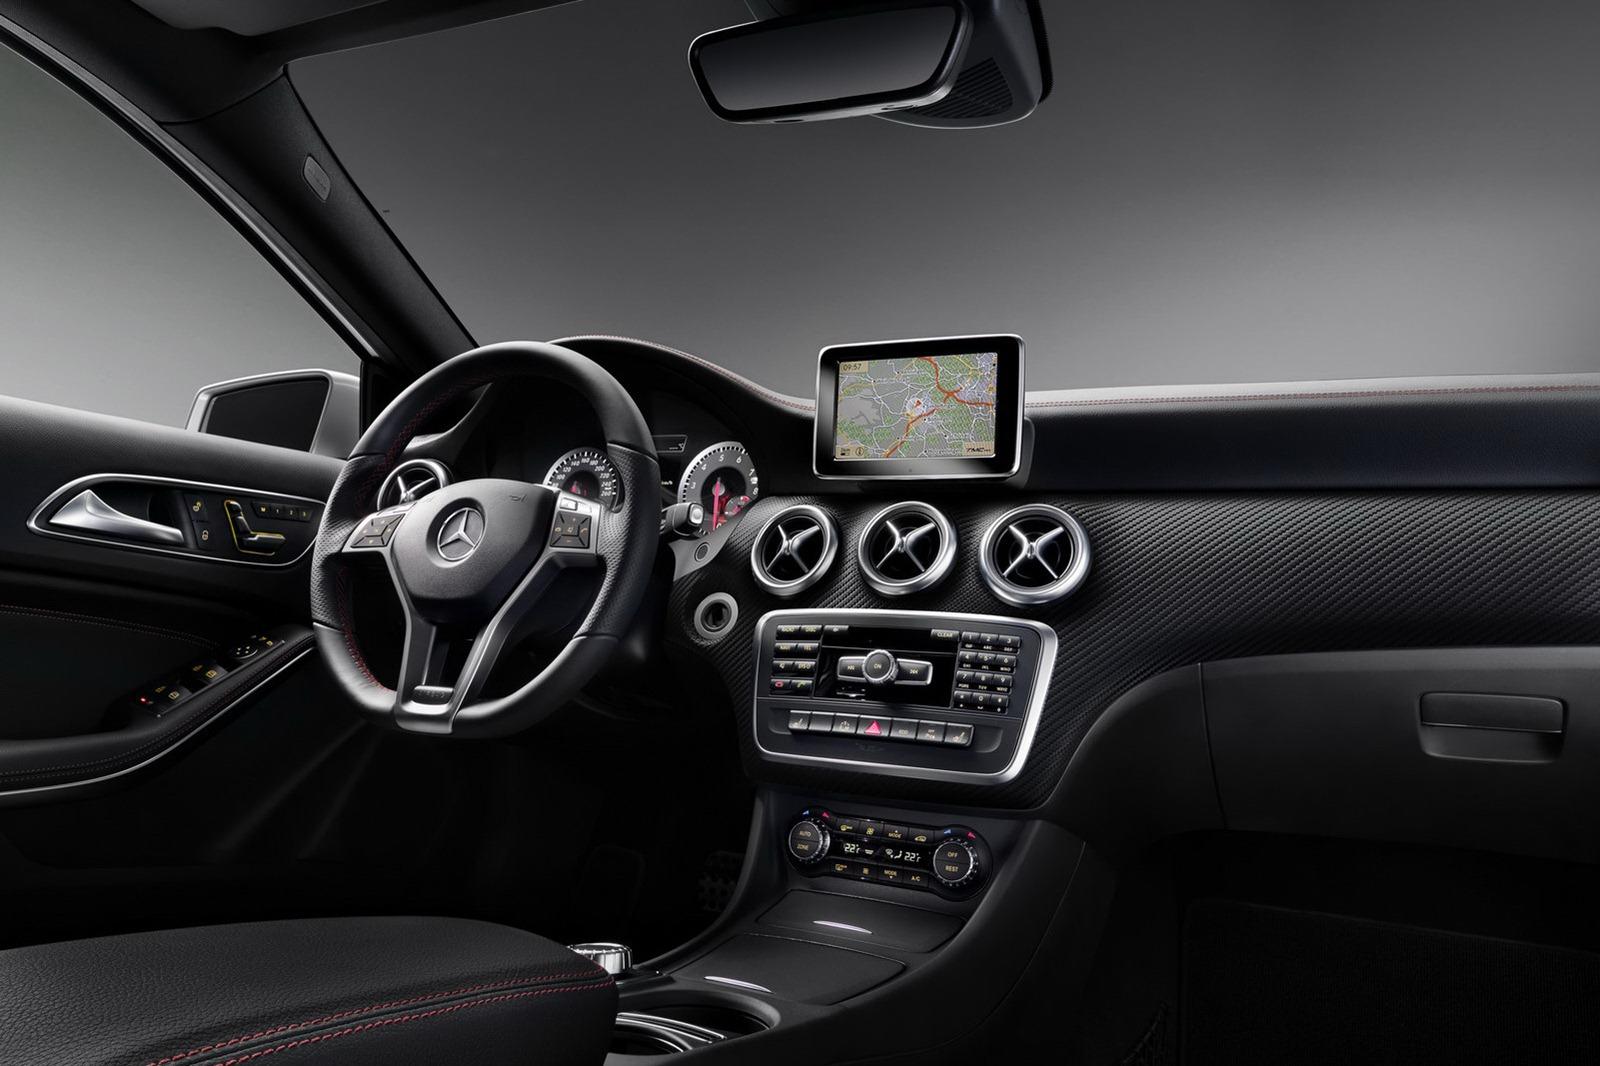 Nuova Mercedes Classe A Prime Immagini Ufficiali